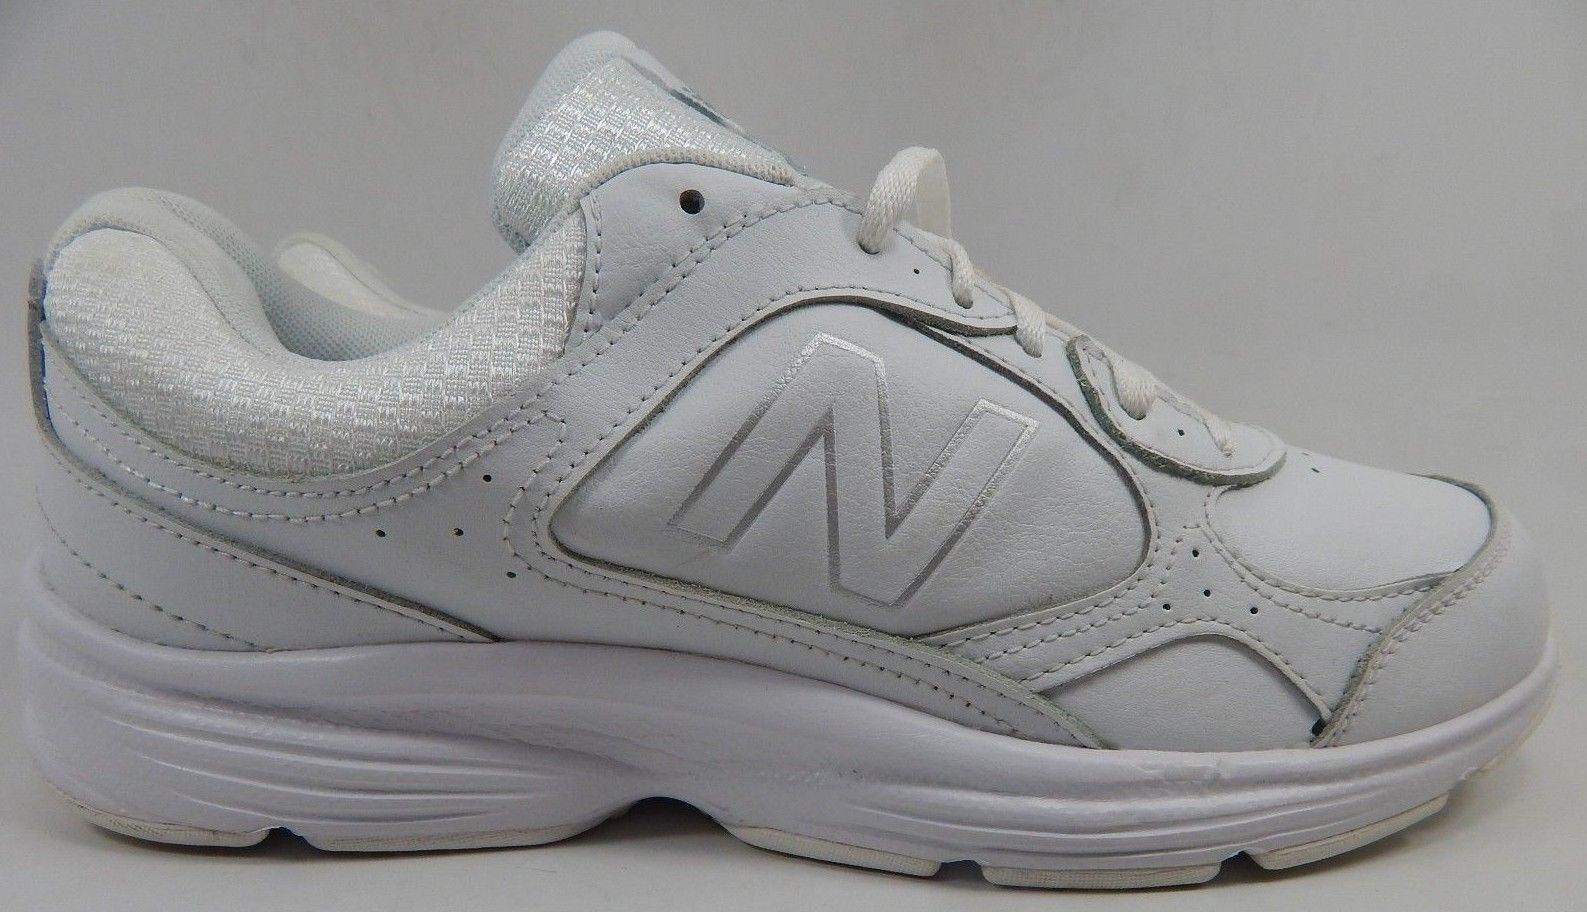 New Balance 405 Women's Walking Shoes Size: US 9 M (B) EU 40.5 White WW405SW2